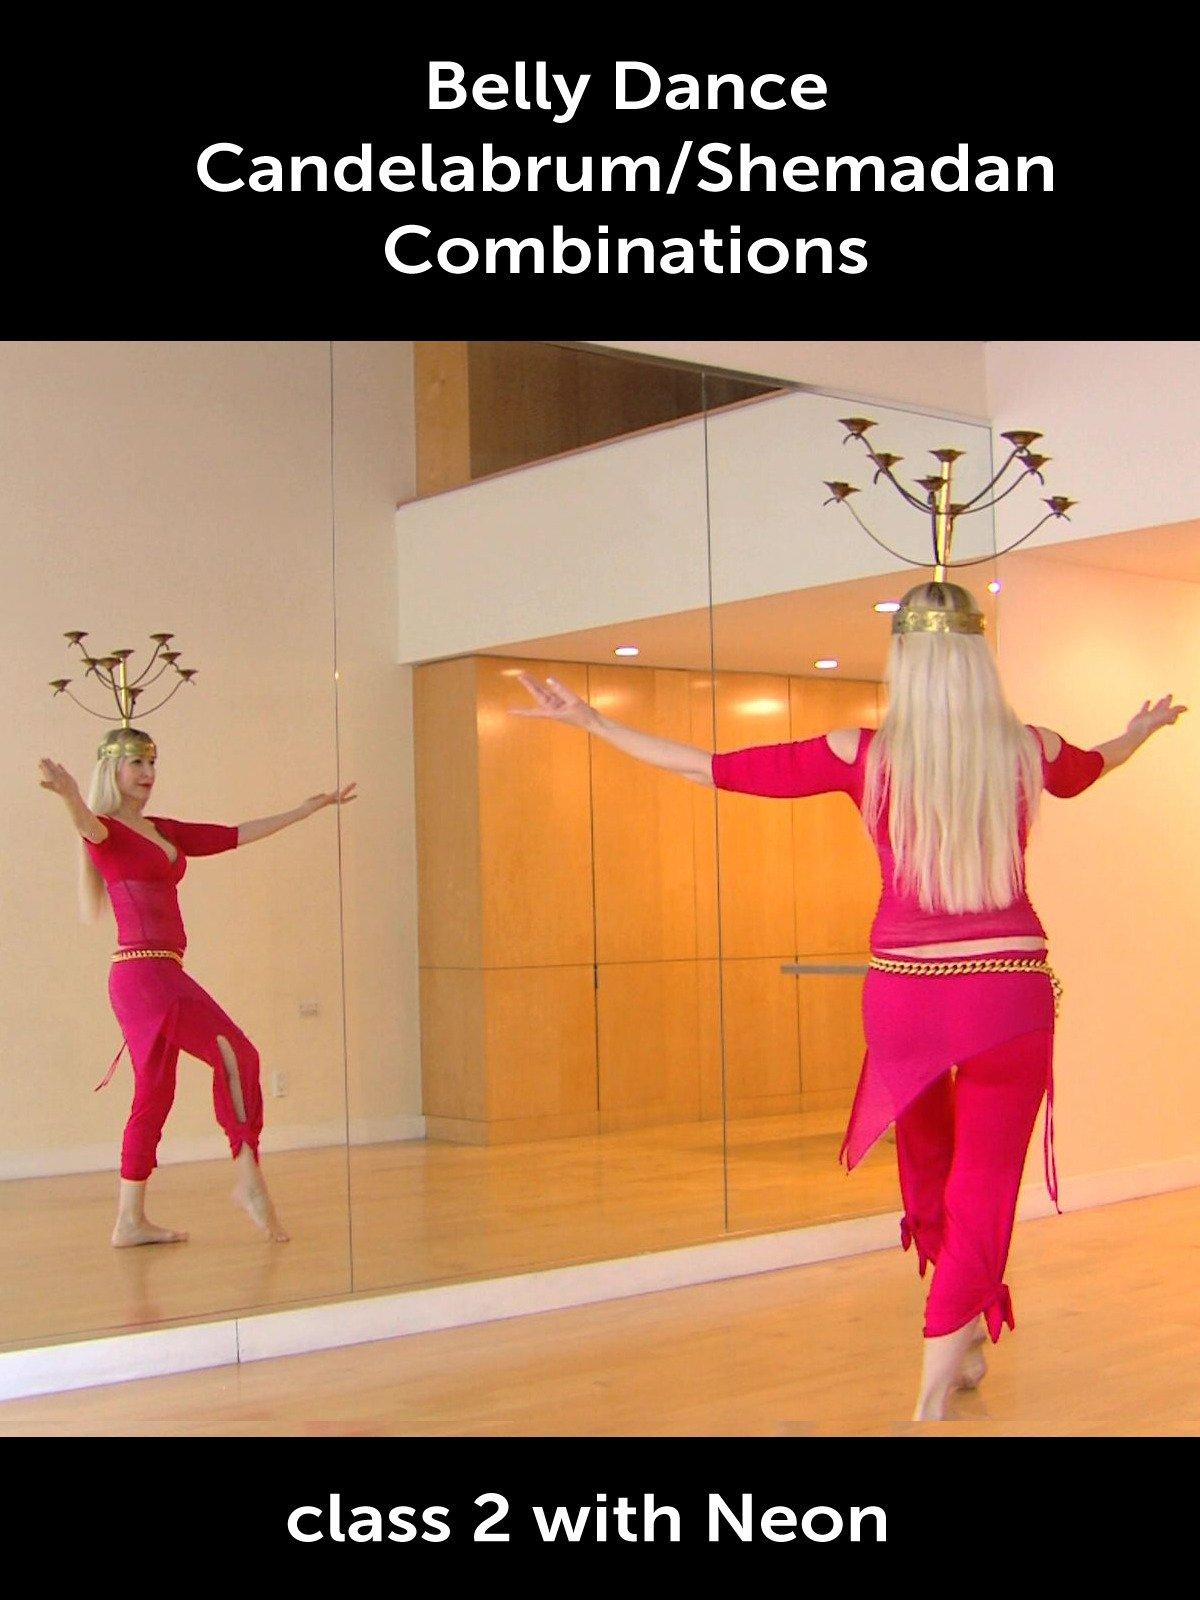 Belly Dance Candelabrum/Shemadan Combinations